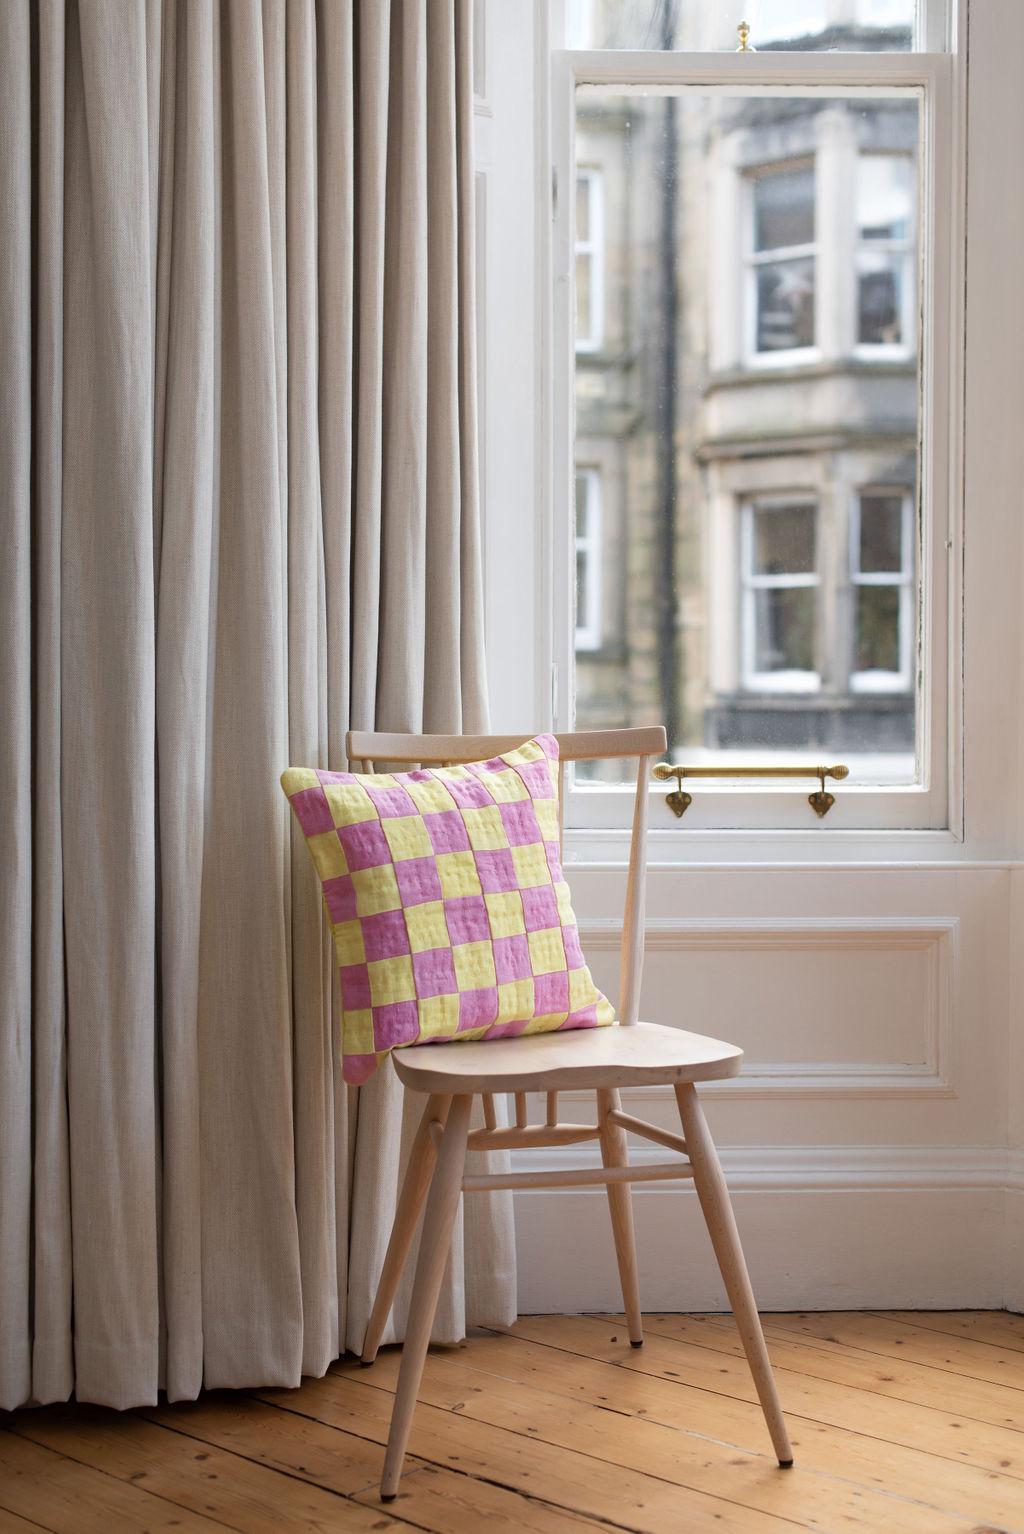 Style Your Spaces X Studio Eldorado  - Pink + Yellow Chequered Cushion